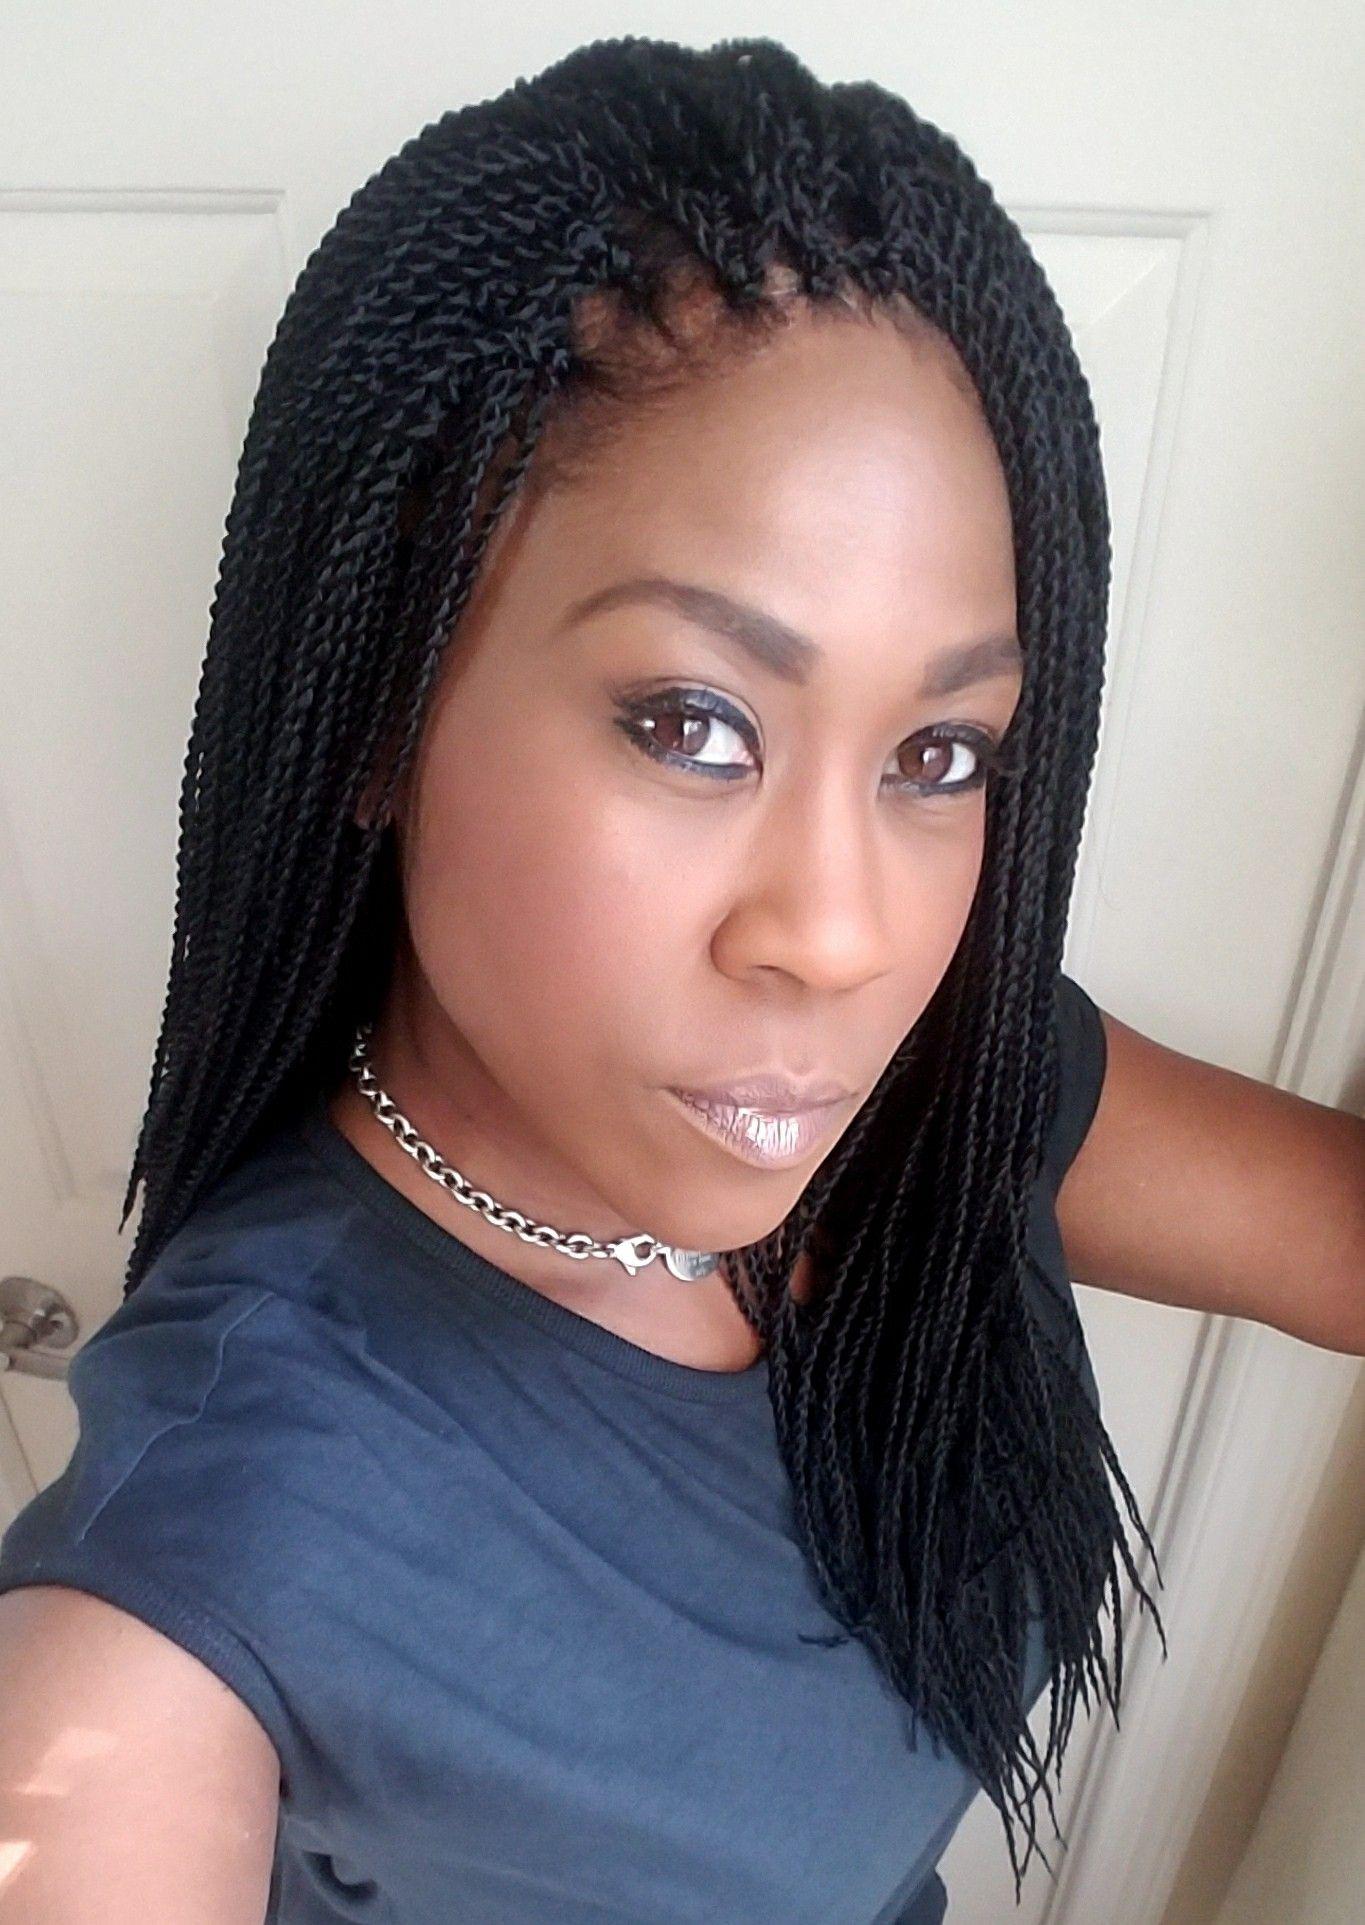 Senegalese Crochet Braids Hairstyles  Mico senegalese crochet braid hairstyle Hairstyles for Women